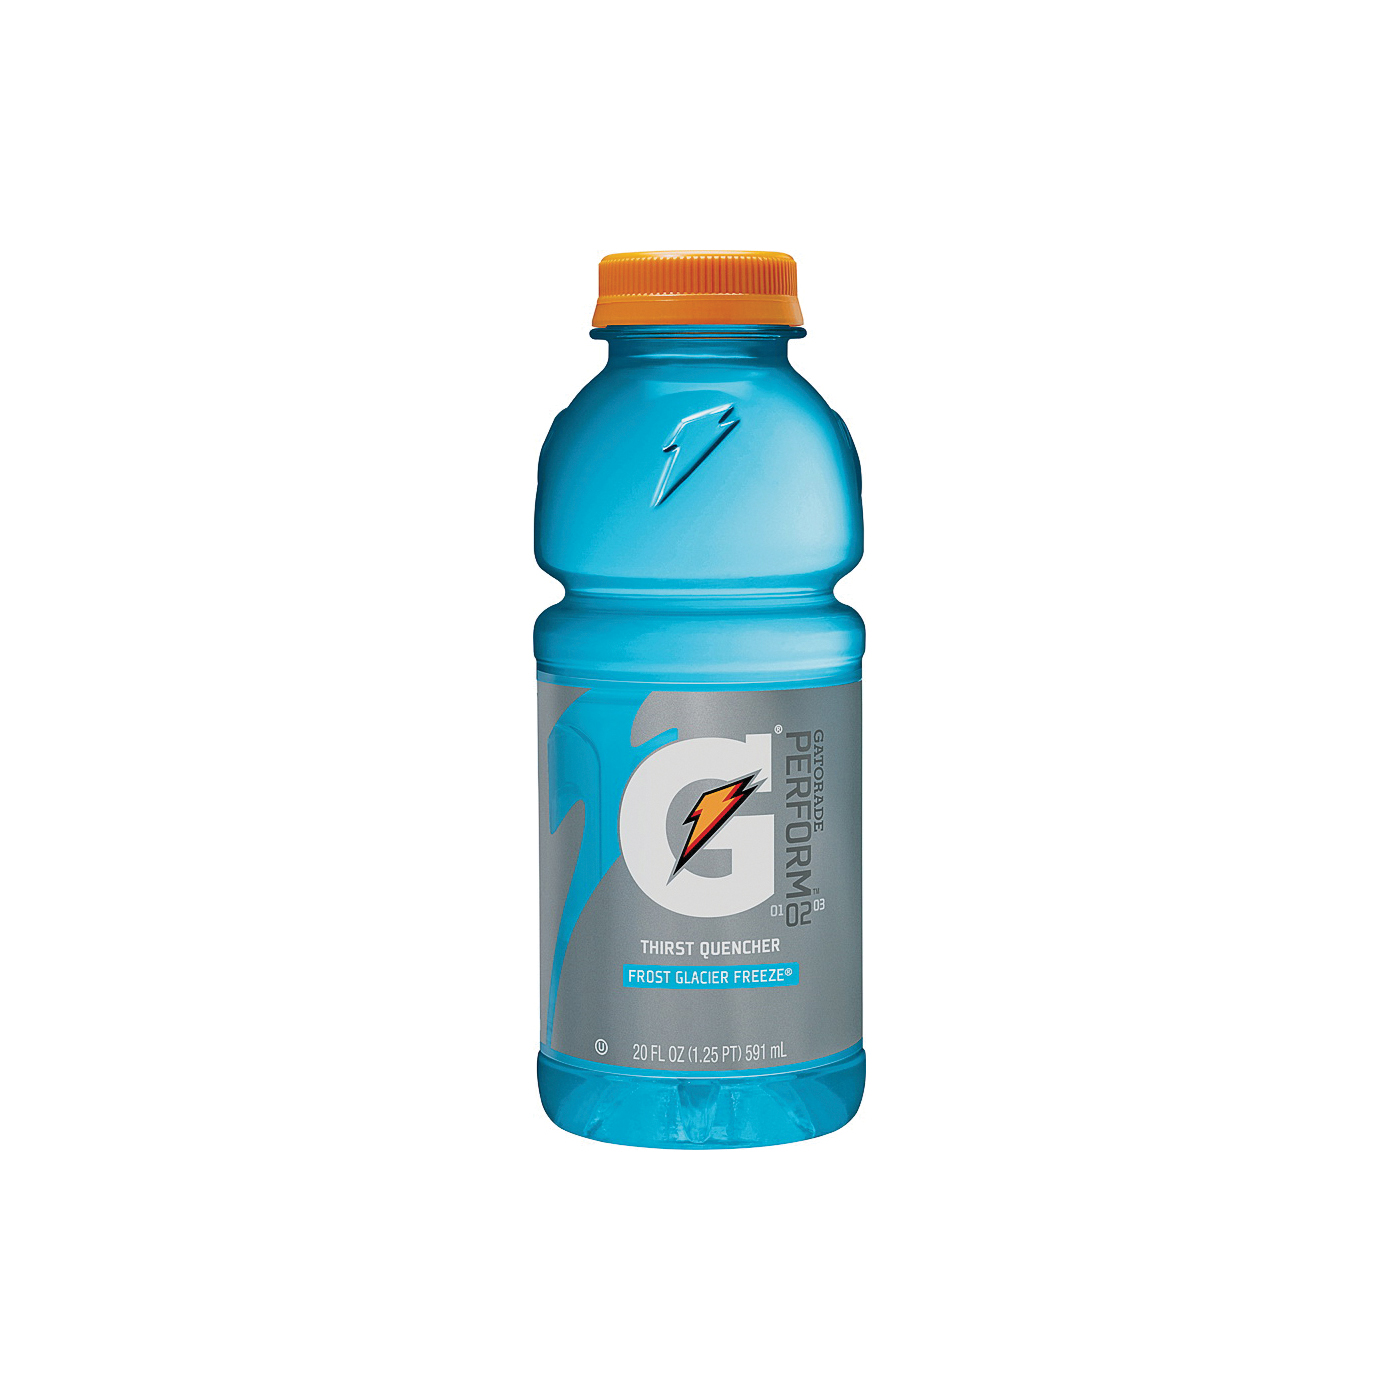 Picture of Gatorade G 32486 Thirst Quencher Sports Drink, Liquid, Glacier Freeze Flavor, 20 oz Package, Bottle